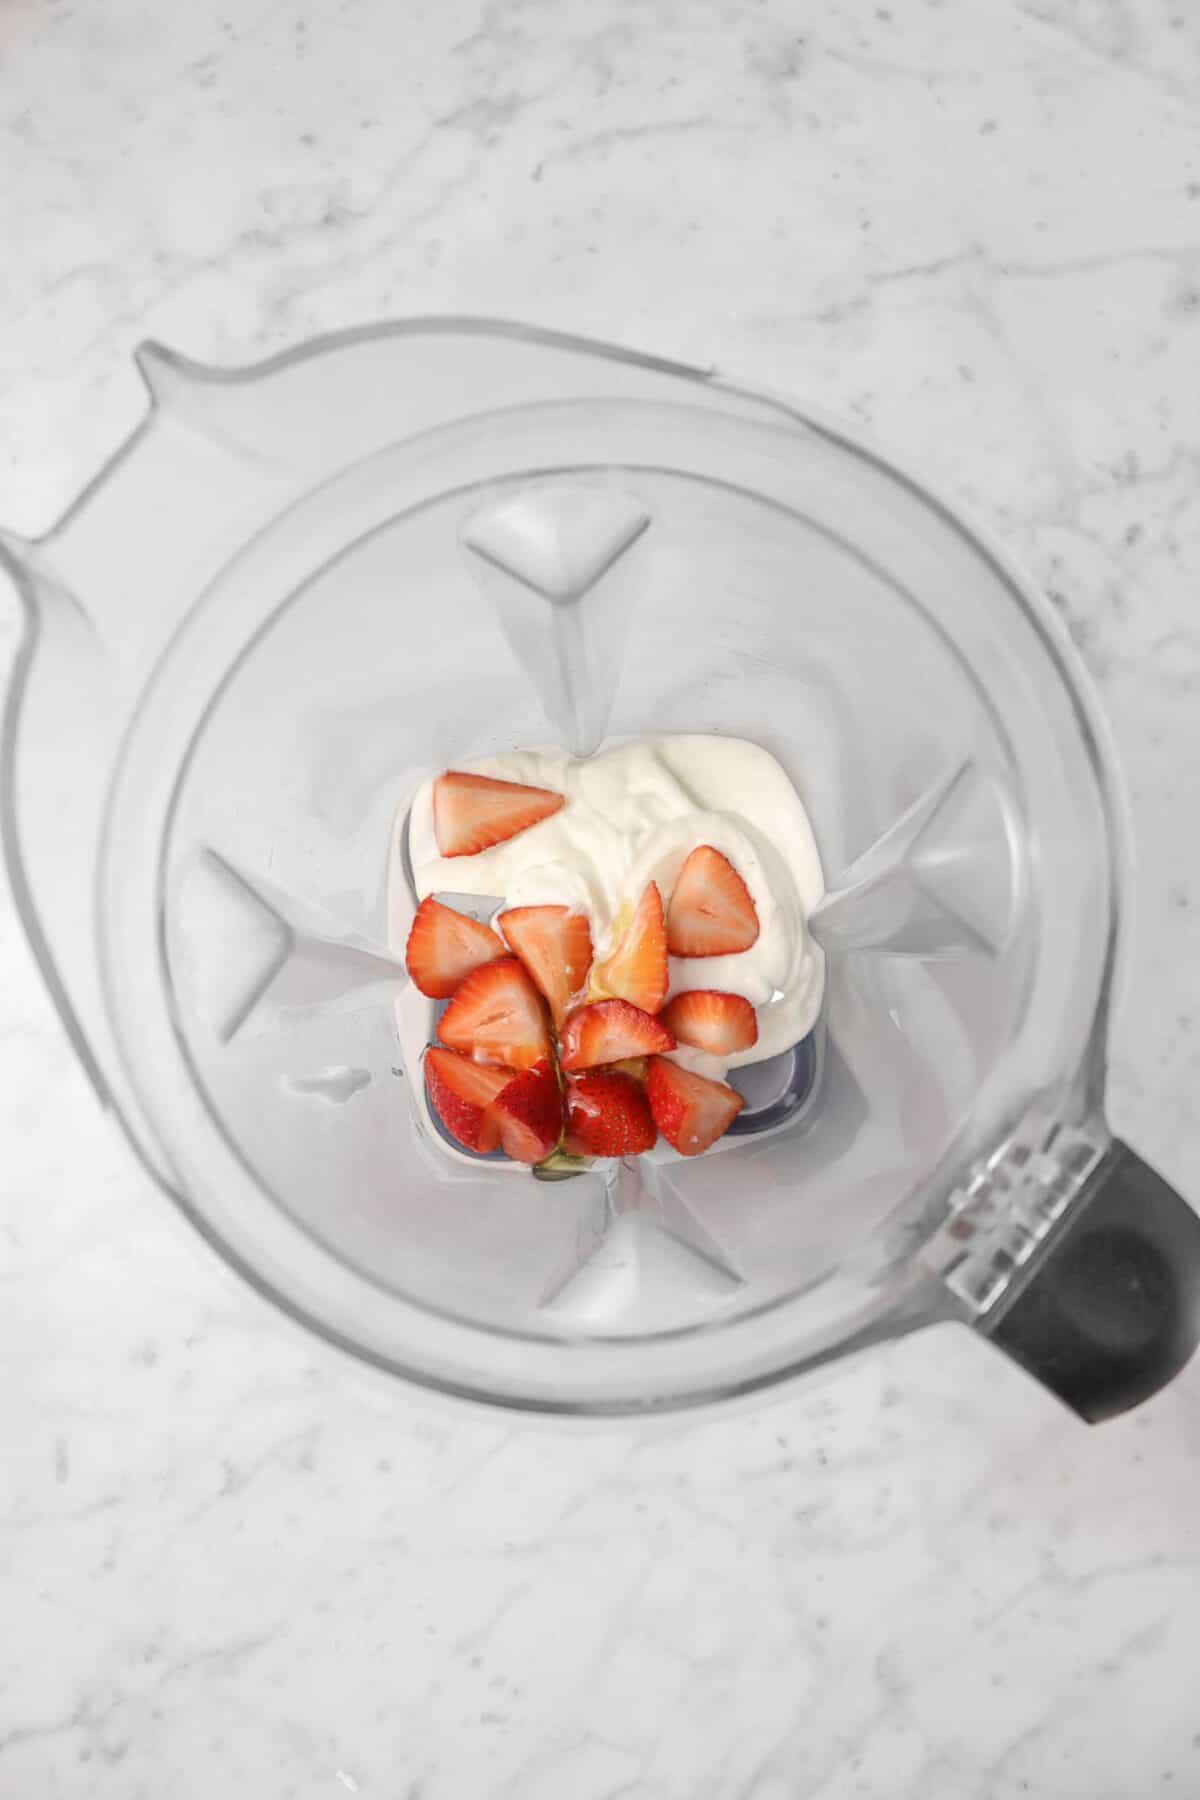 yogurt, honey, and strawberries in a blender